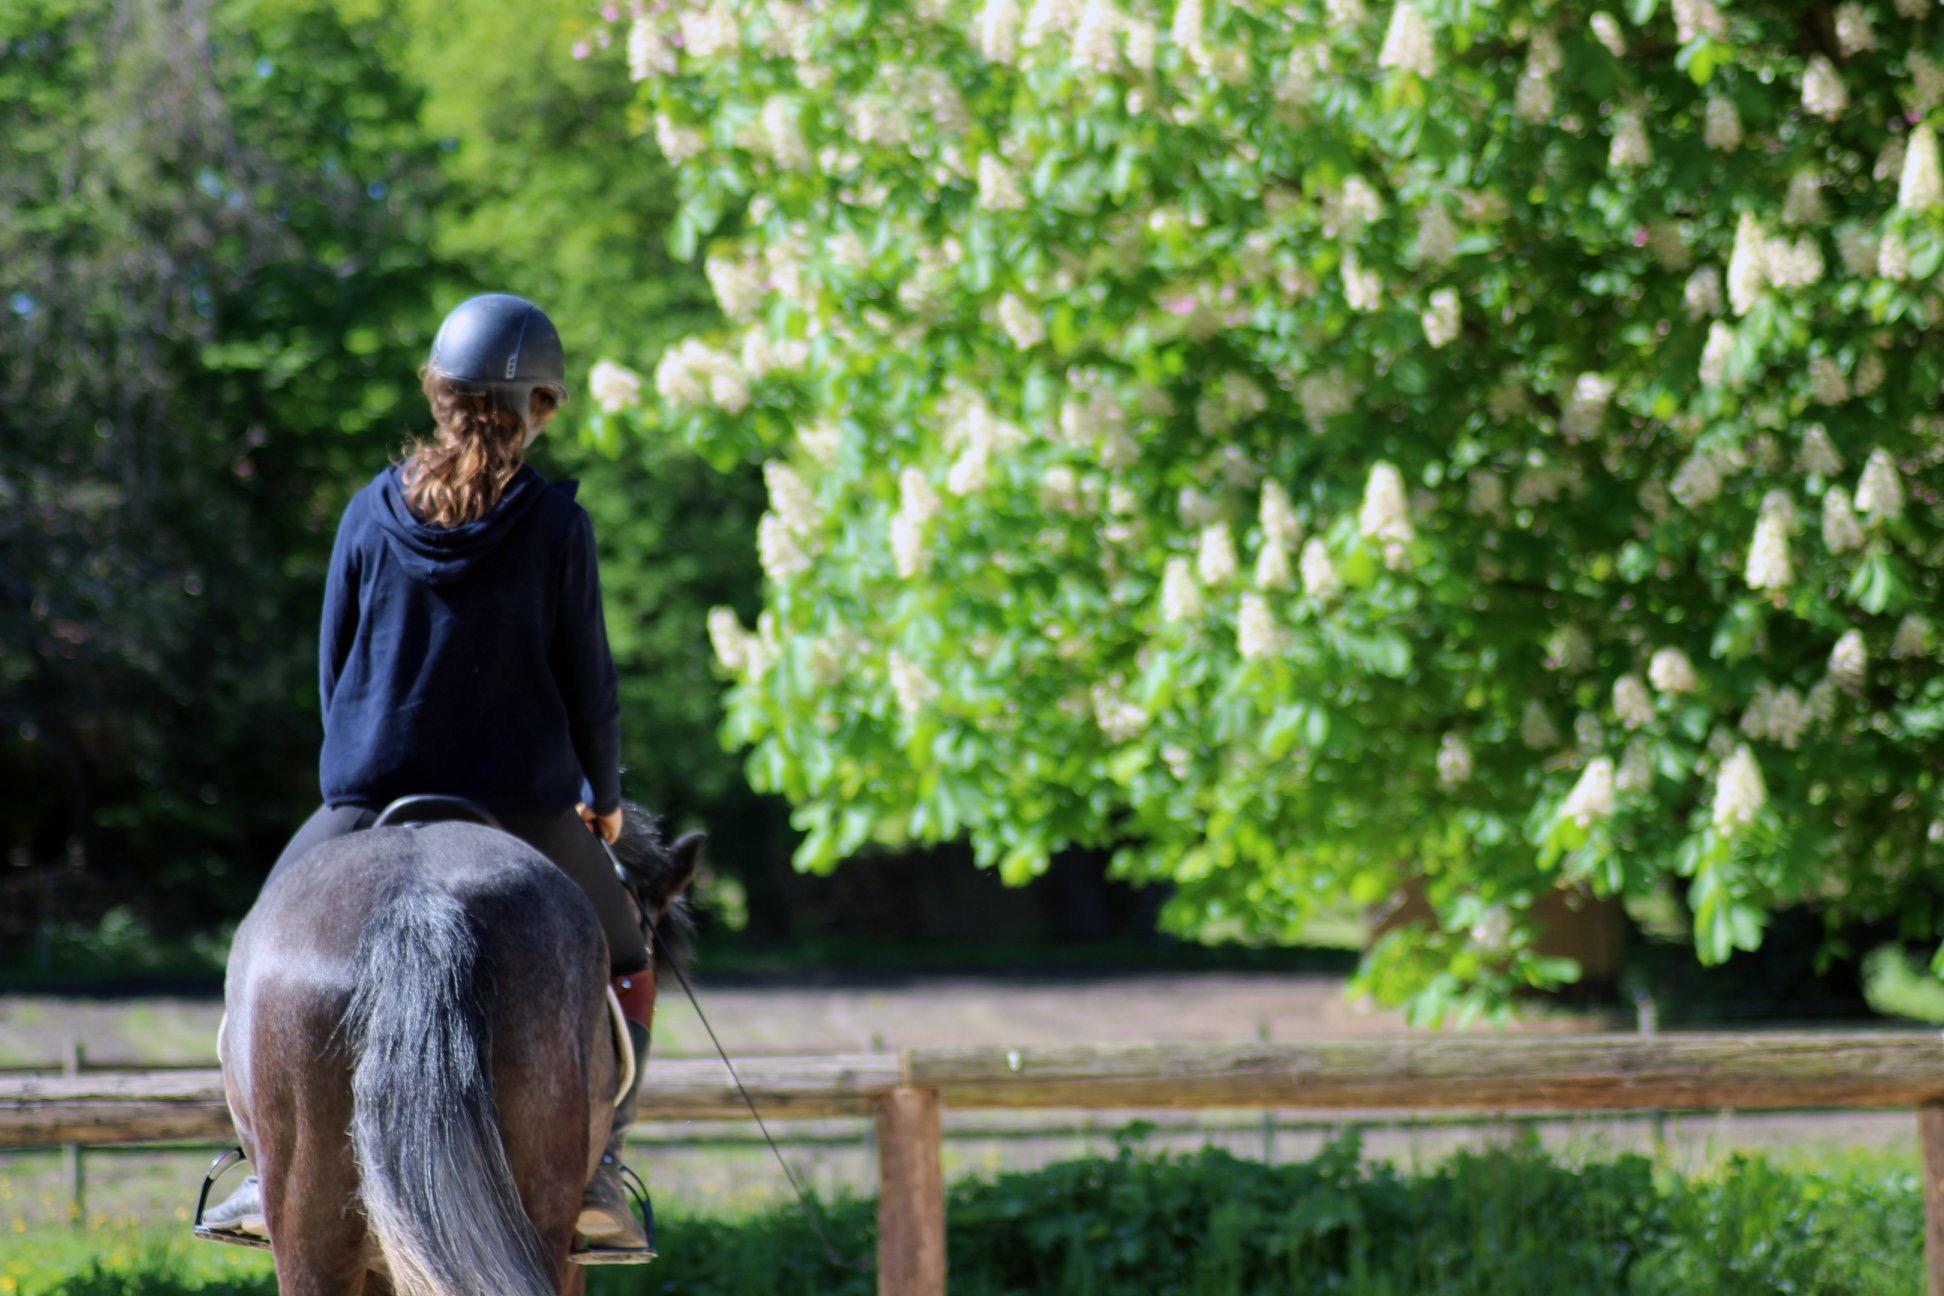 Balade a cheval en foret de rambouillet galluis 78 equitation we 2